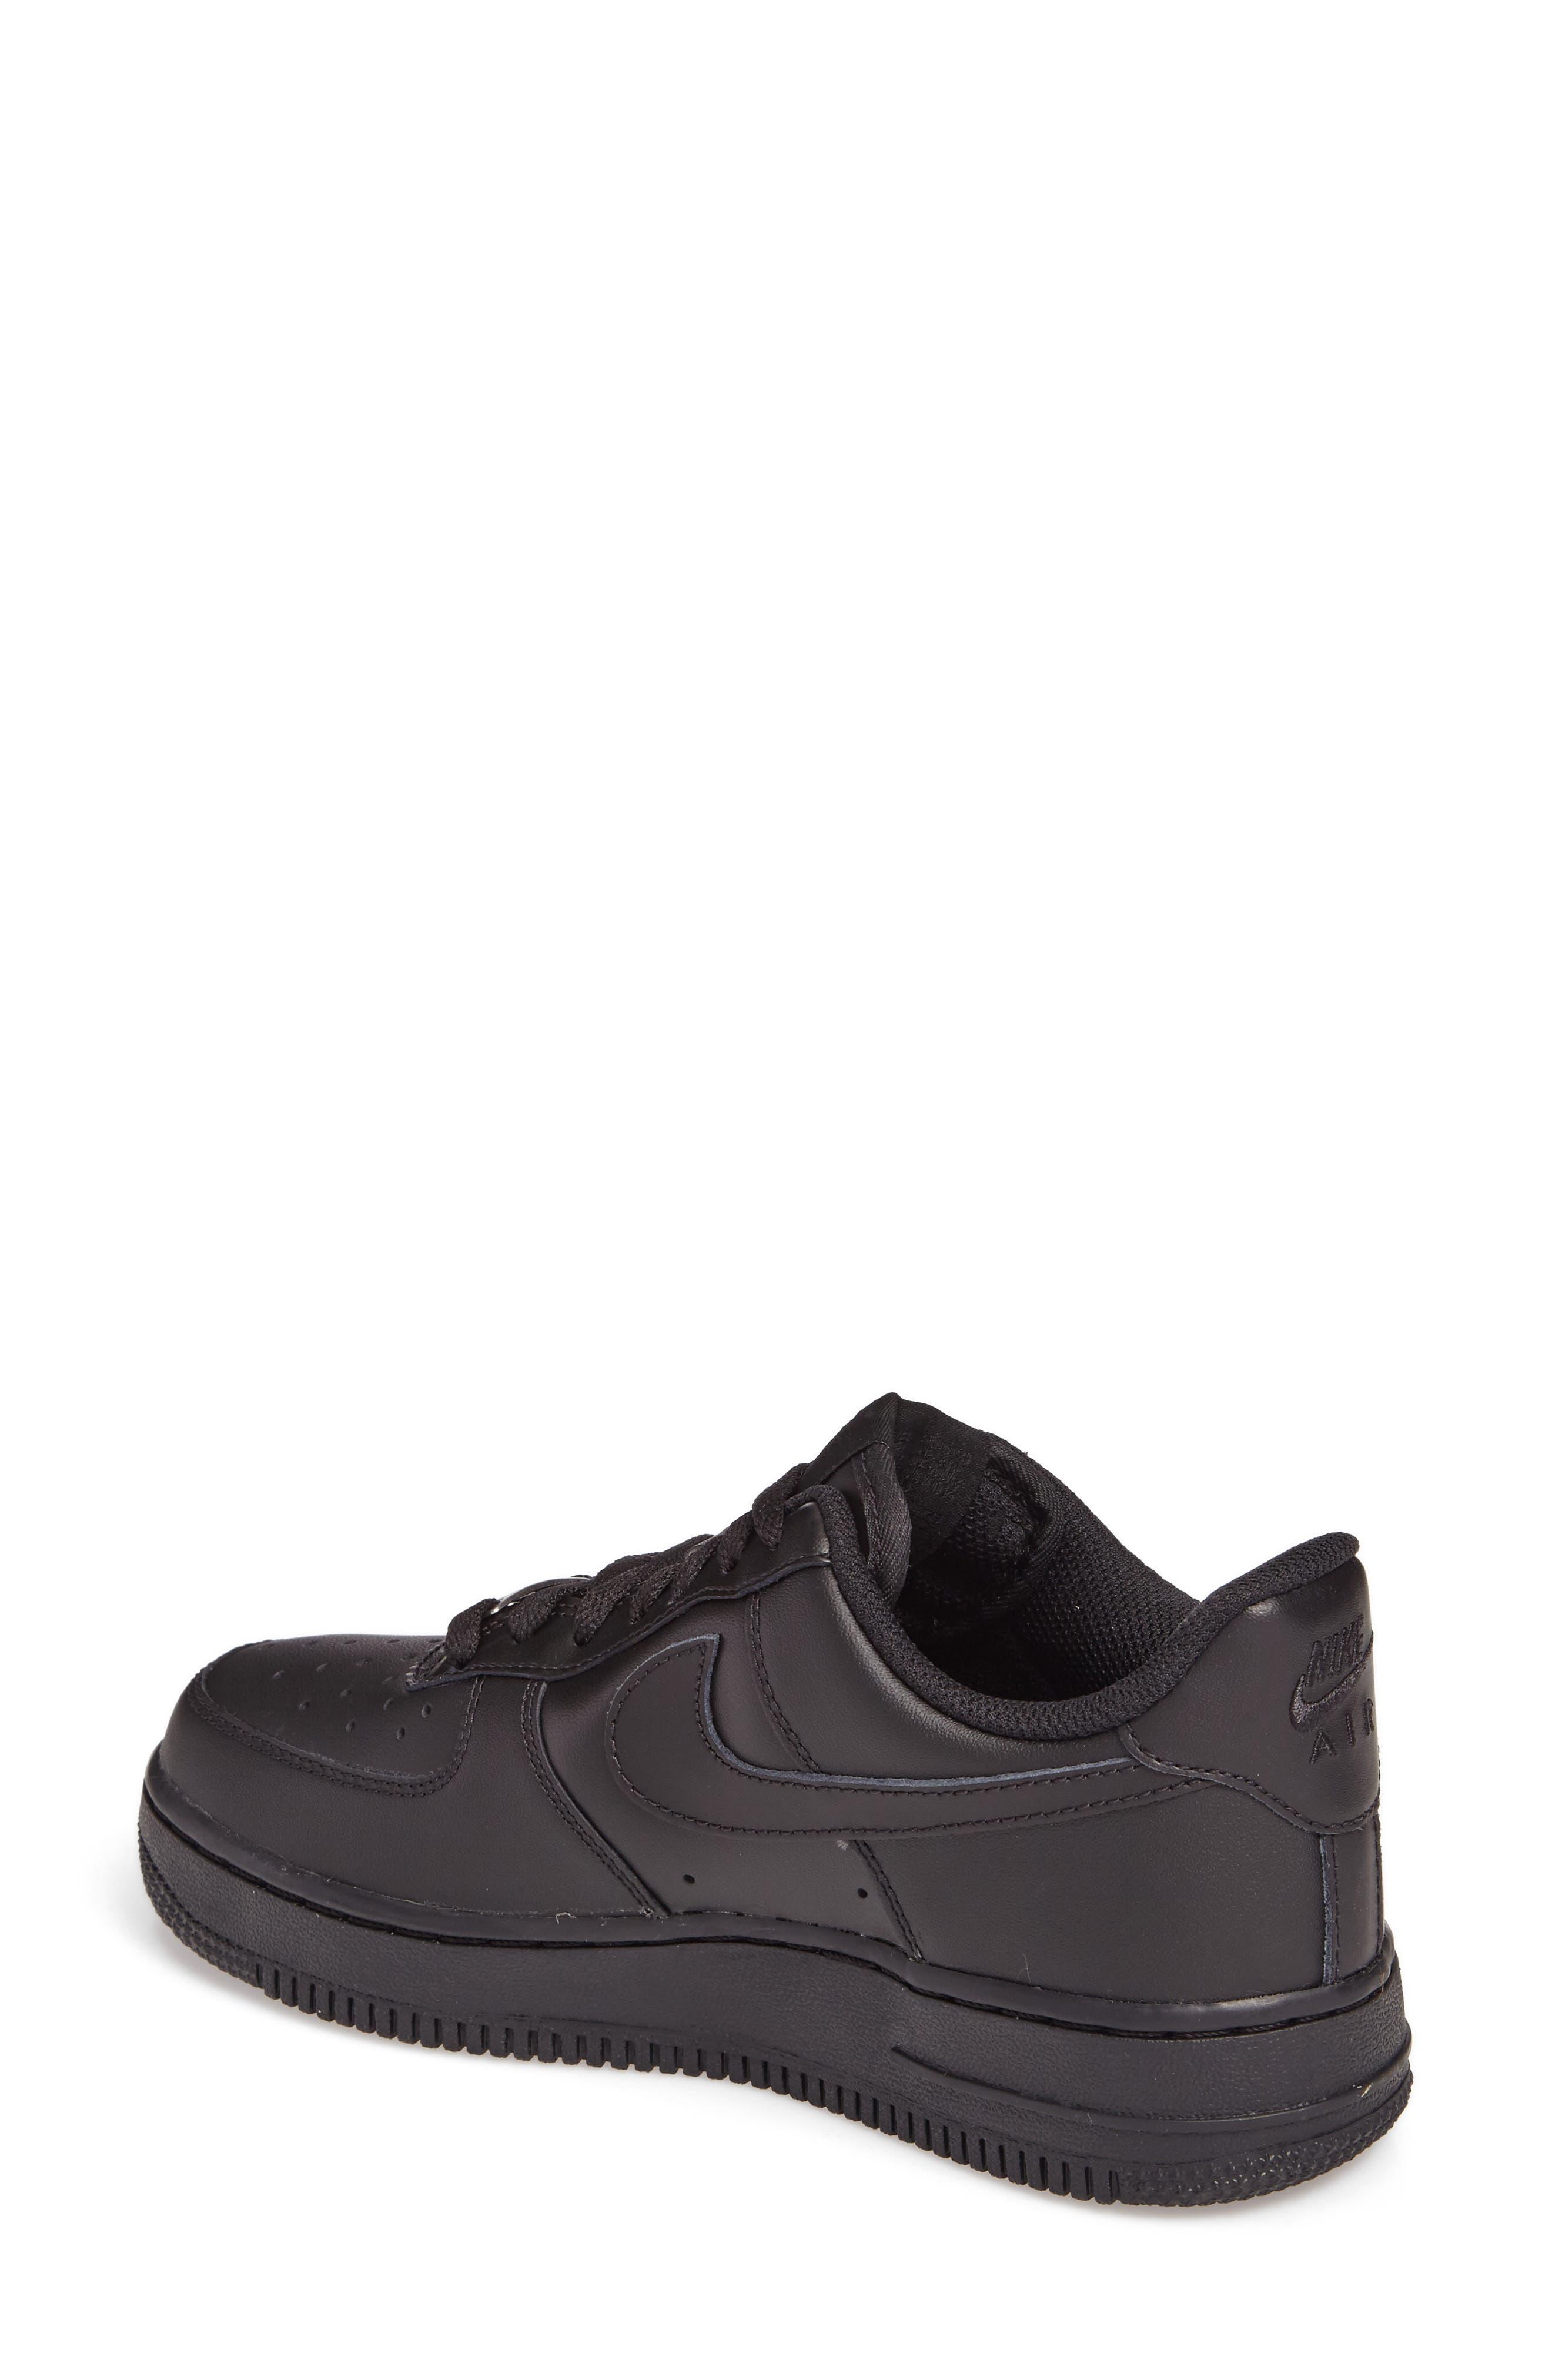 'Air Force 1' Basketball Sneaker,                             Alternate thumbnail 2, color,                             BLACK/ BLACK